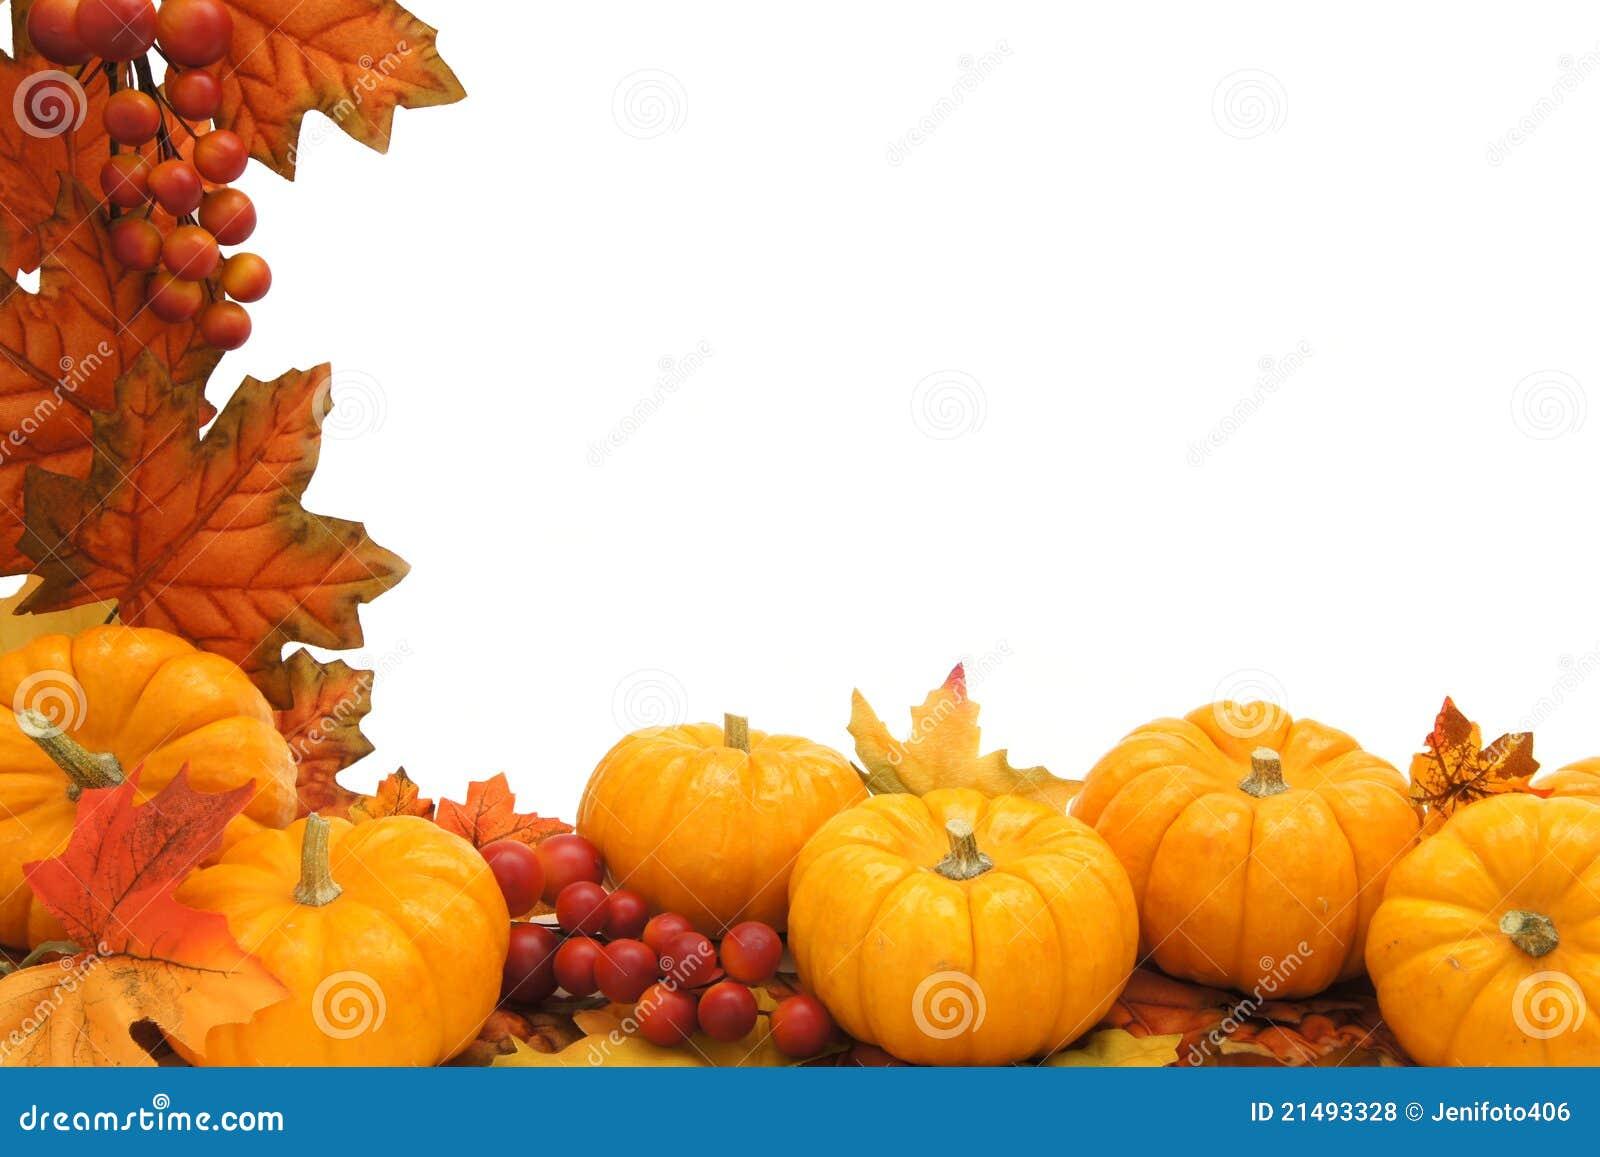 autumn border stock photo image of colorful edge golden 21493328